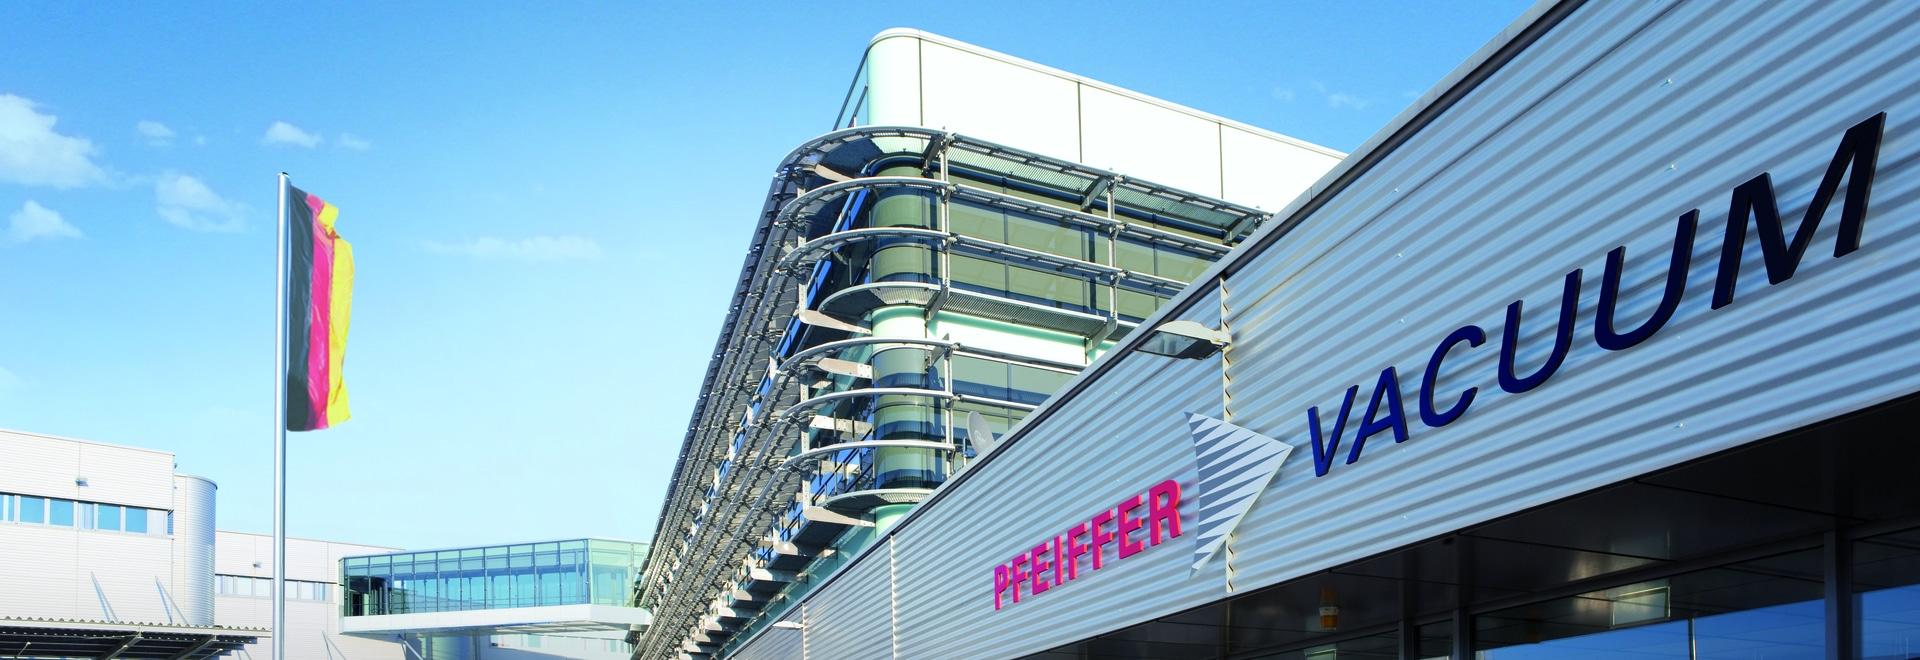 Pfeiffer Vacuum Firmengebaeude Asslar